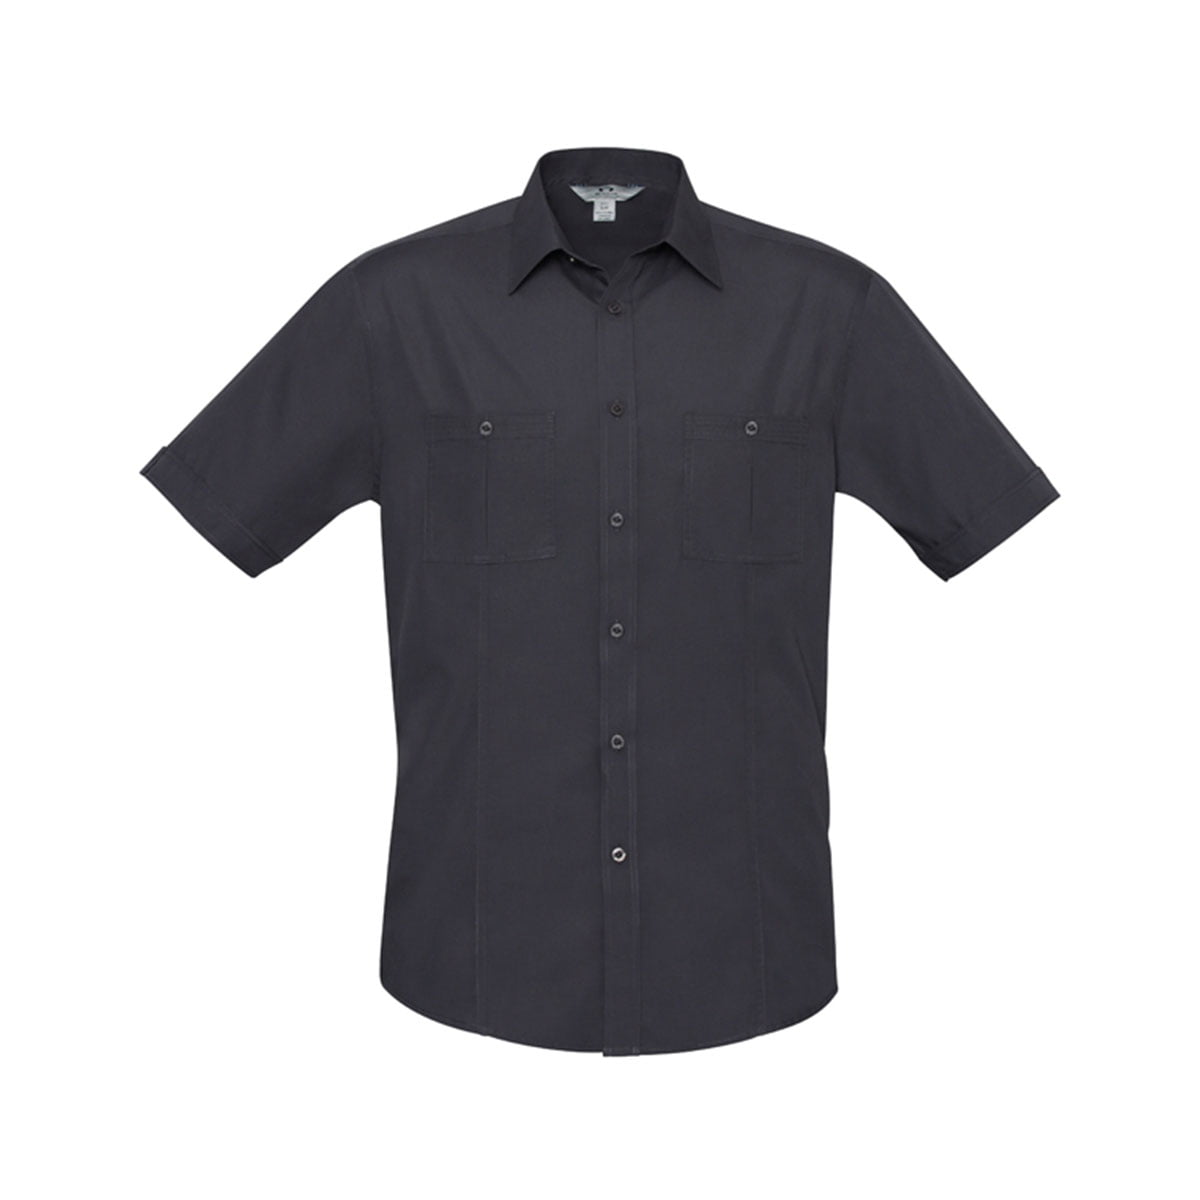 Mens Bondi Short Sleeve Shirt-Charcoal